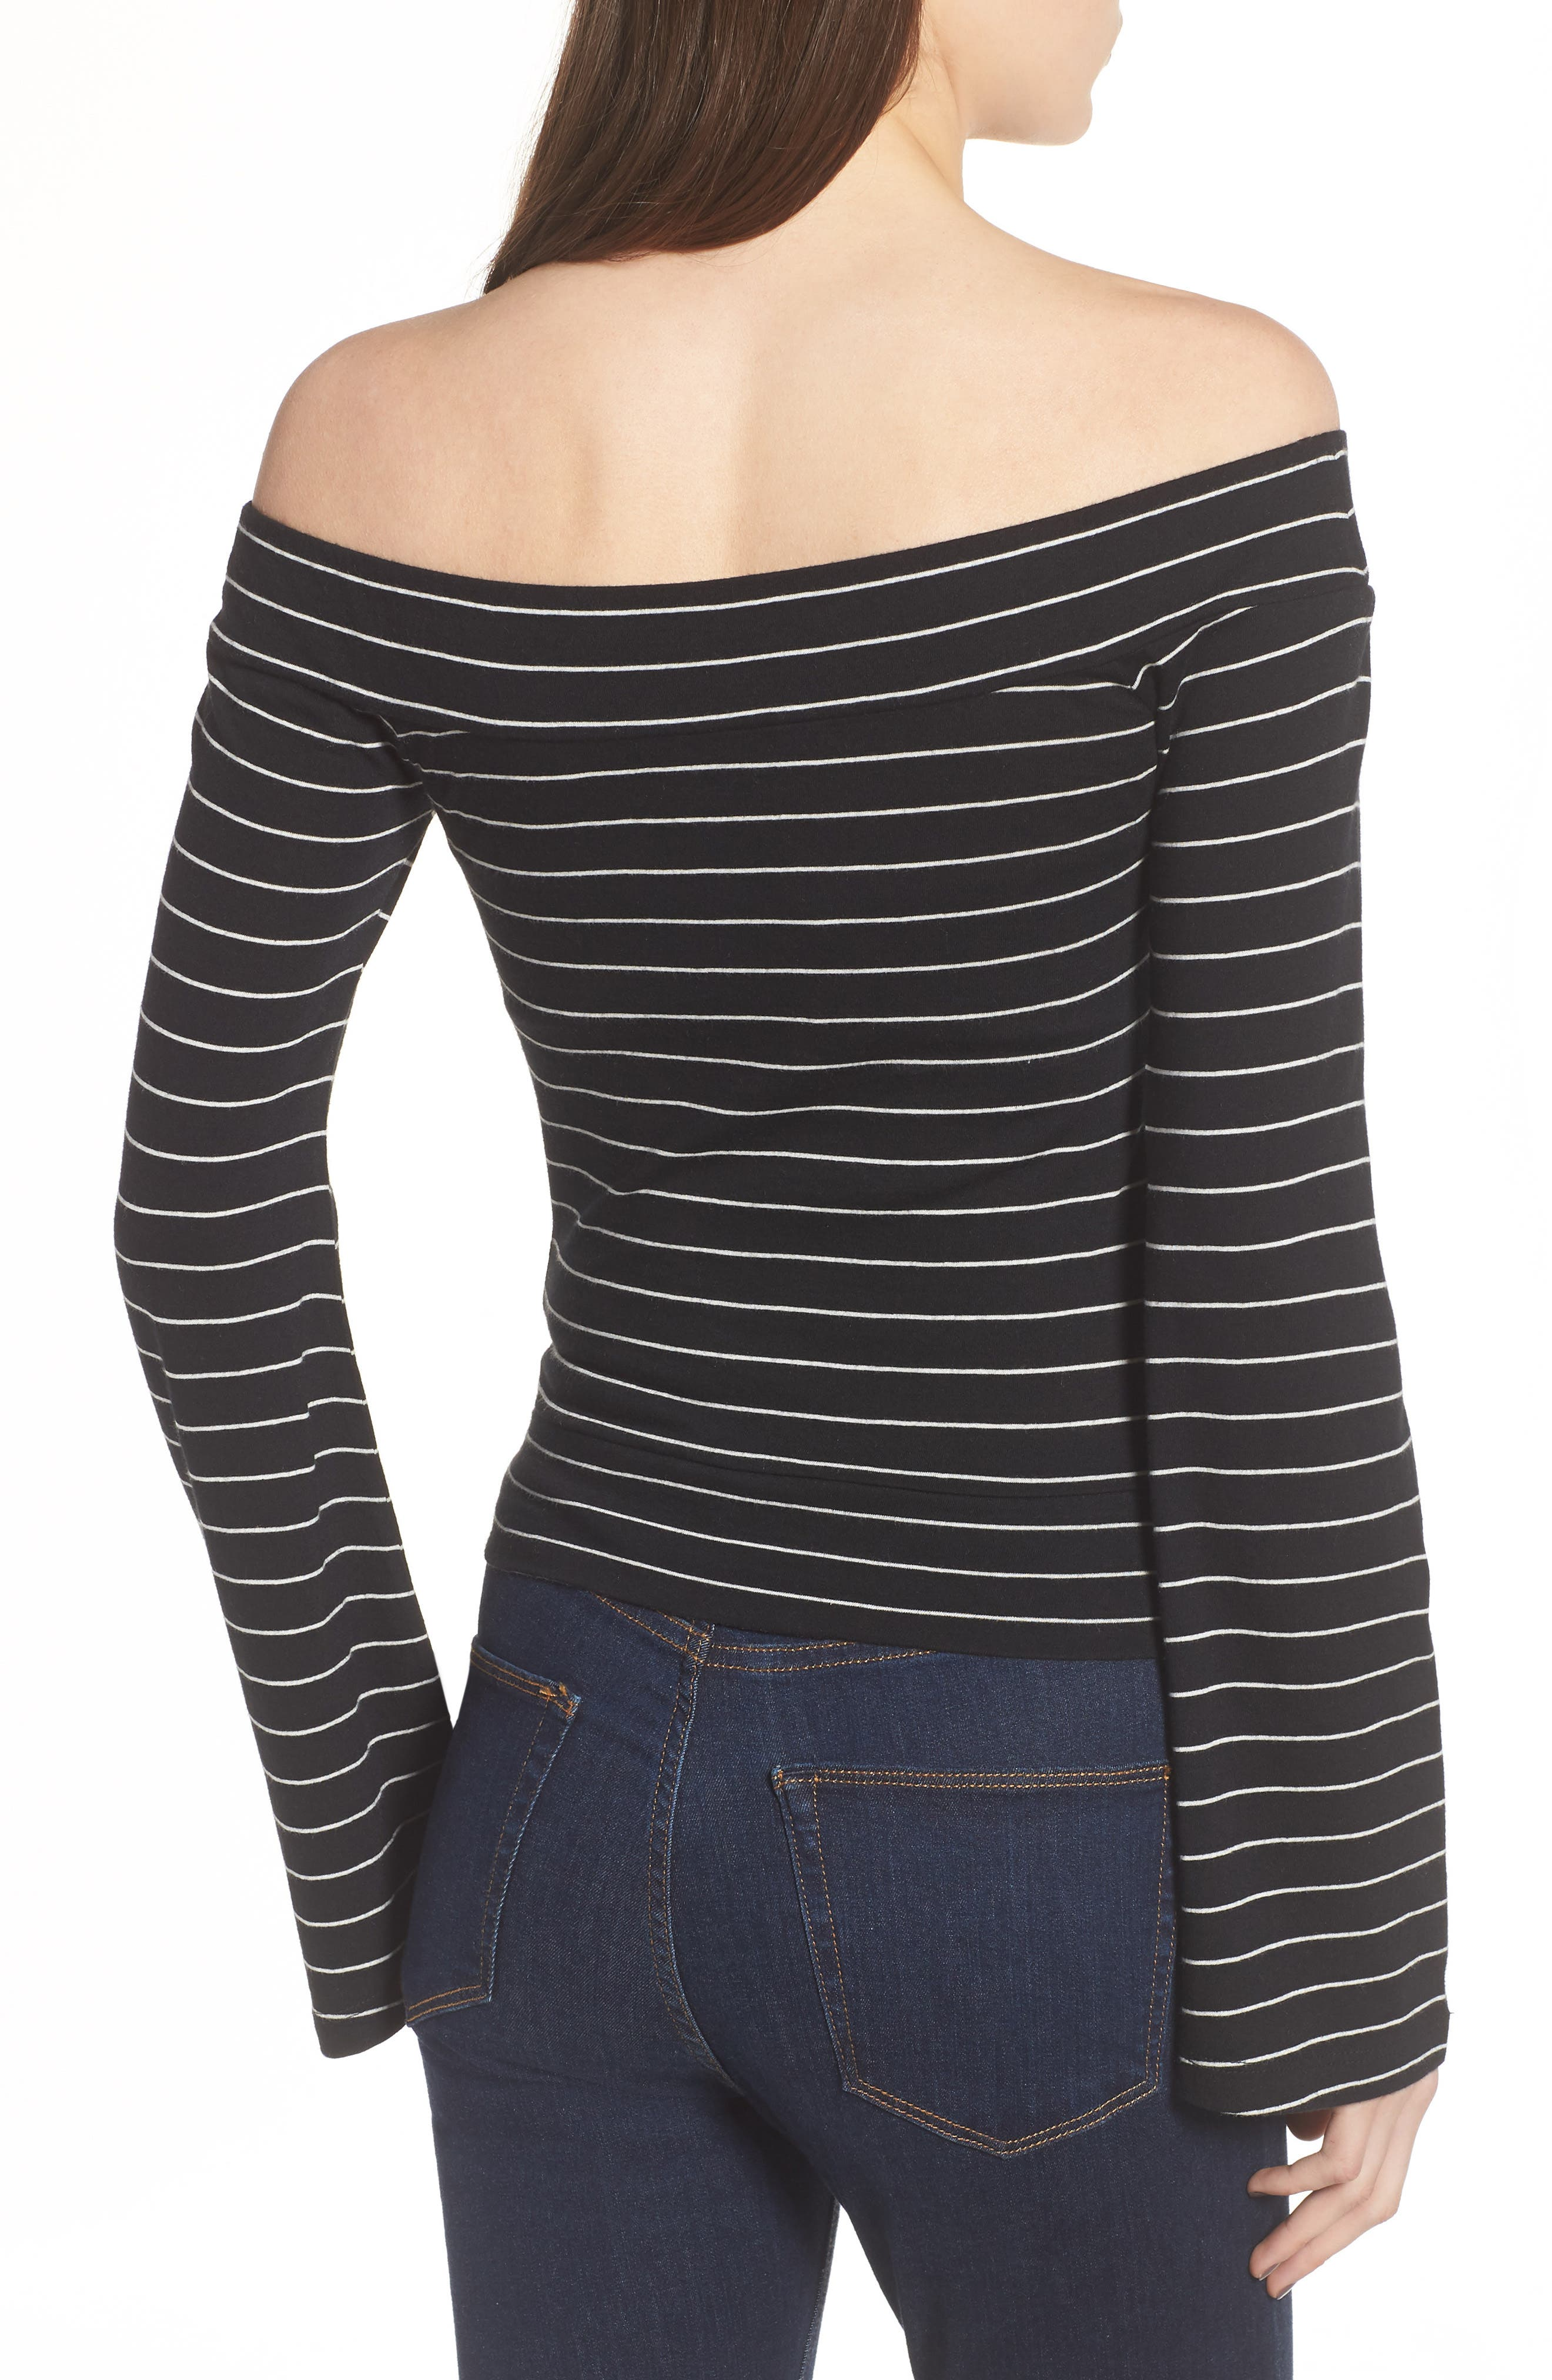 Stripe Twist Front Off the Shoulder Top,                             Alternate thumbnail 2, color,                             Black Jess Strp